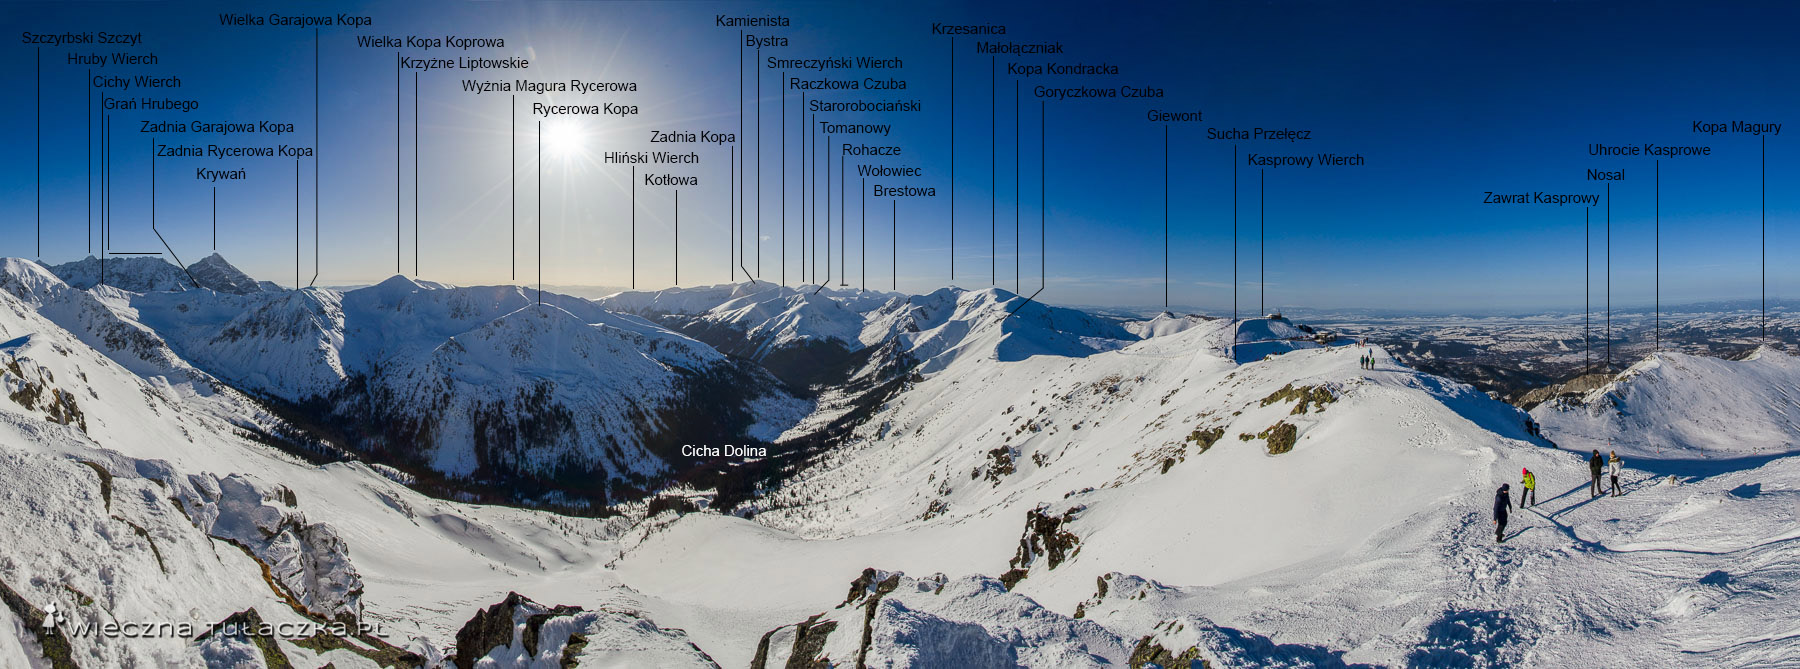 Zimowa panorama z Beskidu